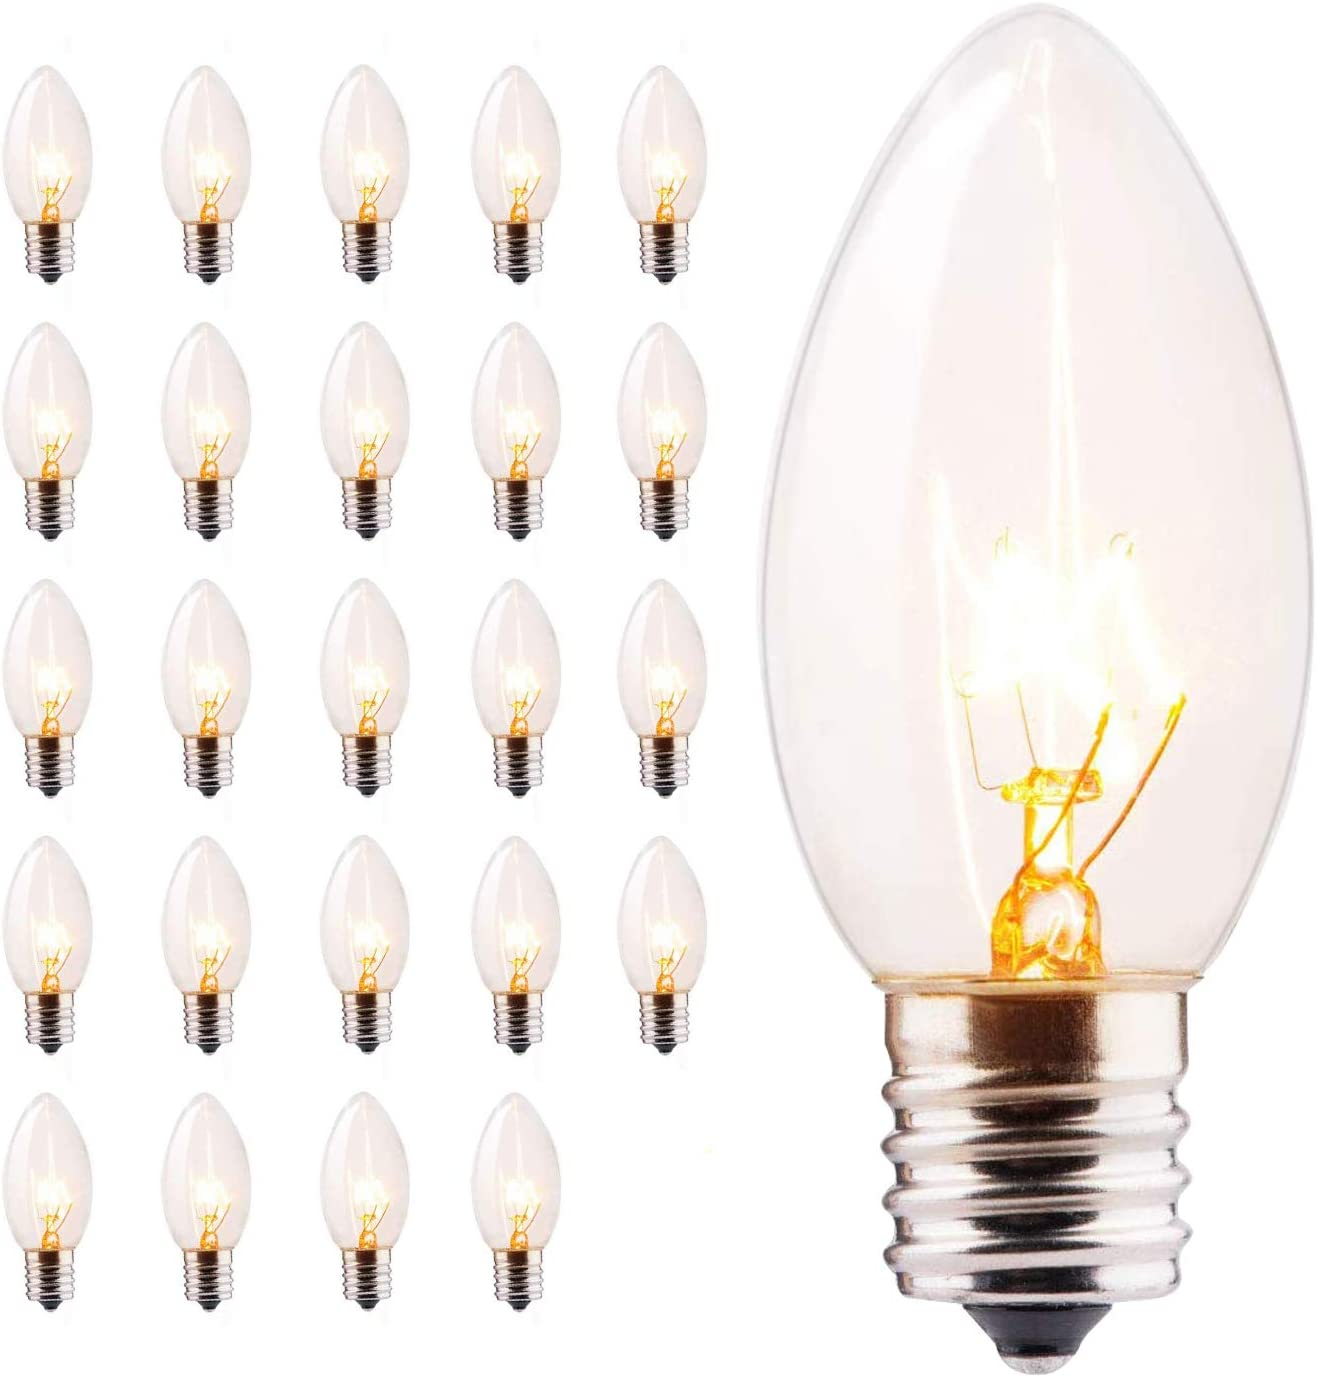 Minetom 25 Pack C9 Clear Replacement Bulbs for Christmas Lights, E17 C9 Intermediate Base Incandescent C9 Christmas Light Bulbs, 7-Watt, Warm White